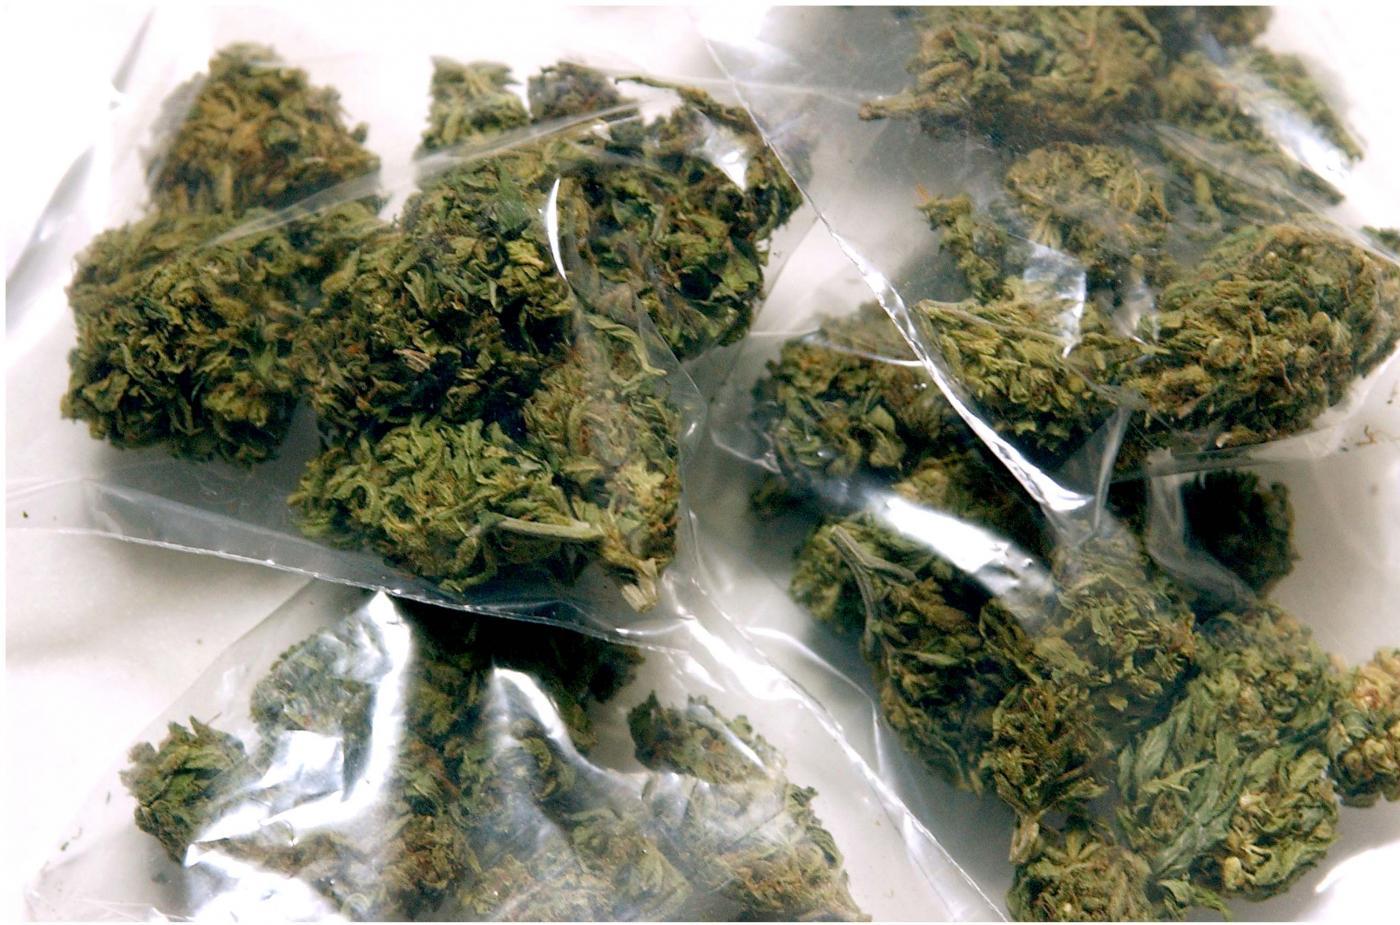 sacchetti di marijuana